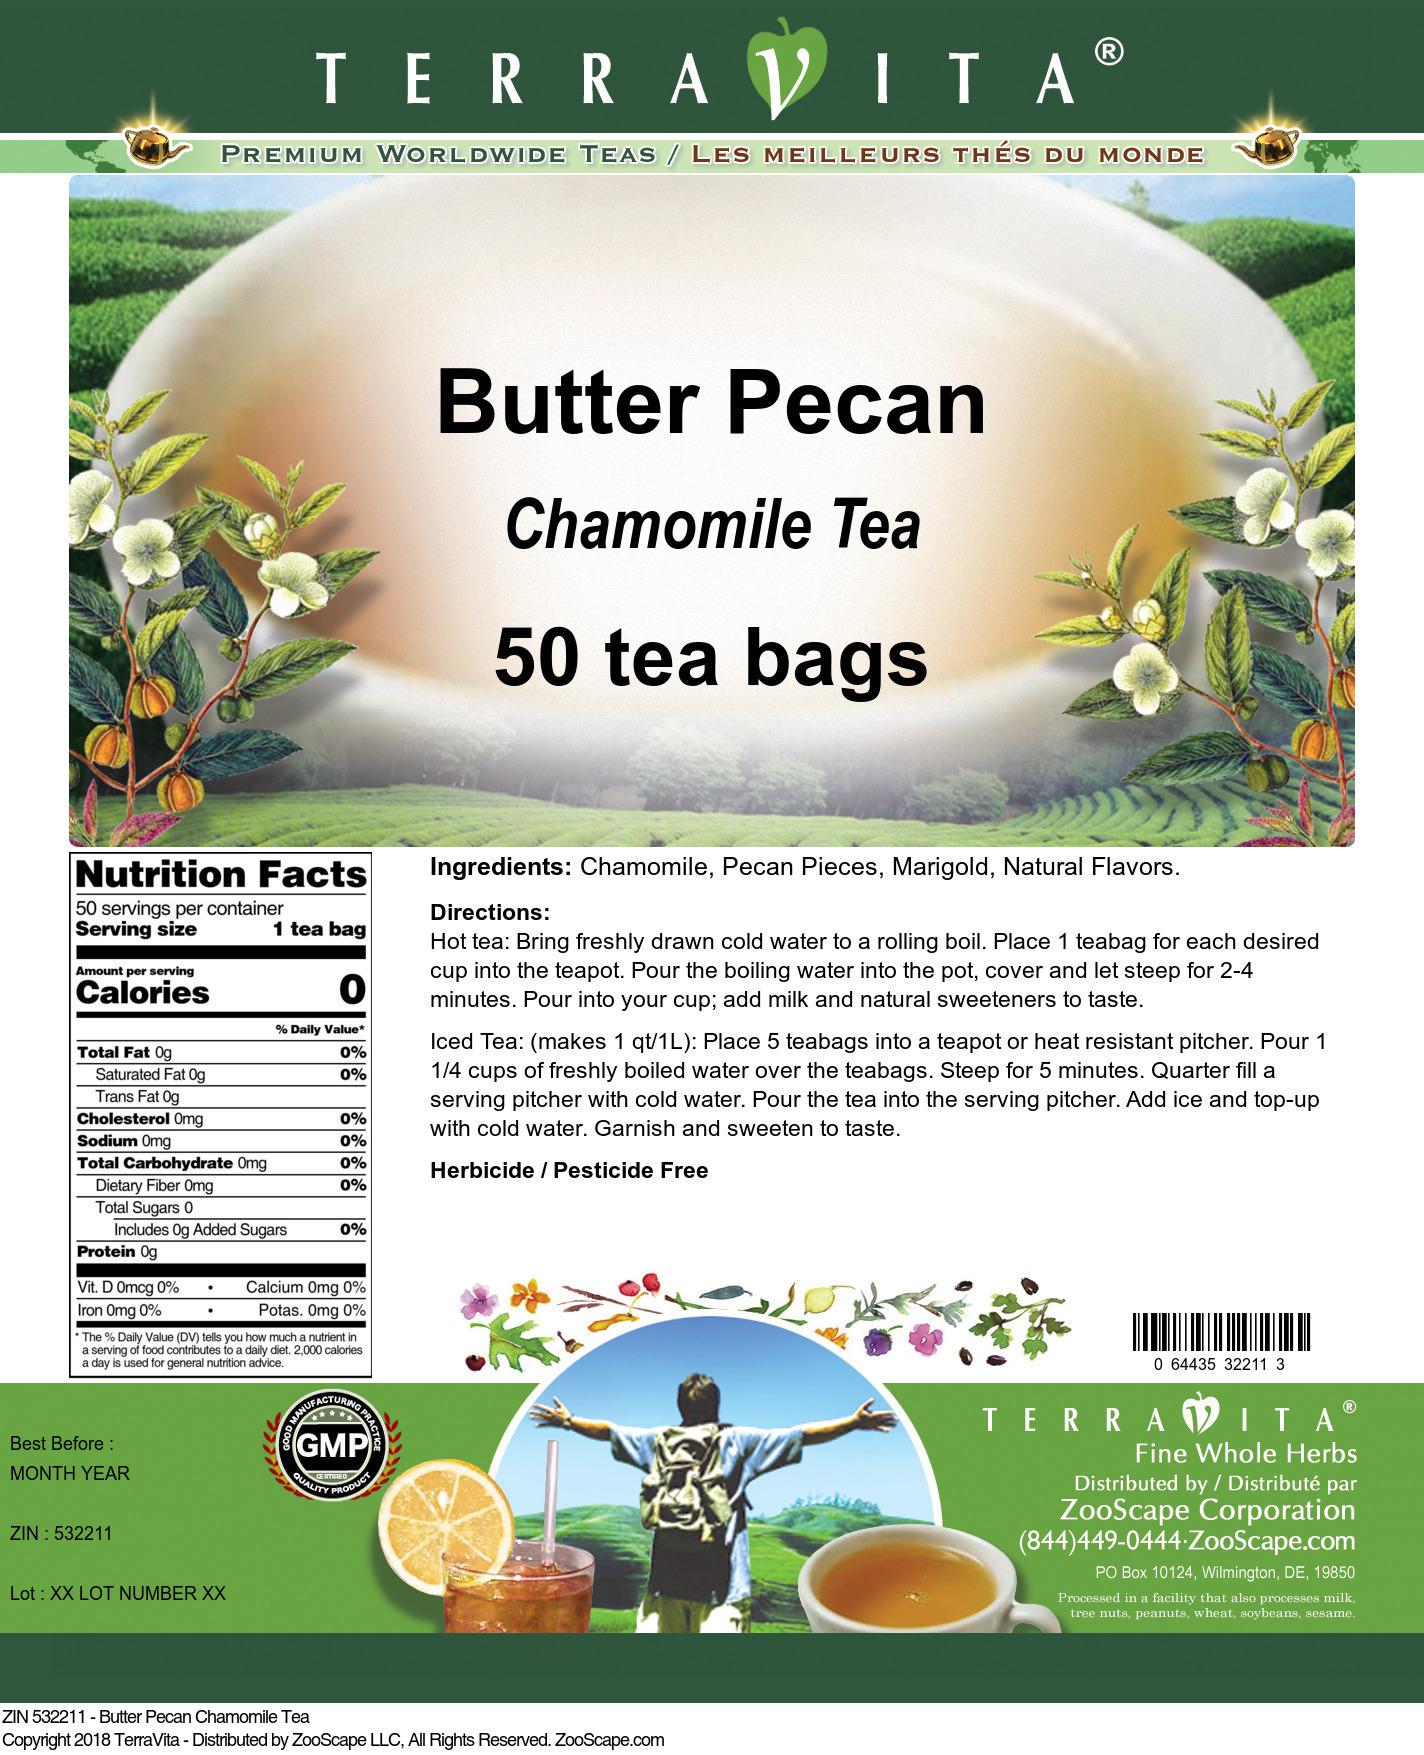 Butter Pecan Chamomile Tea